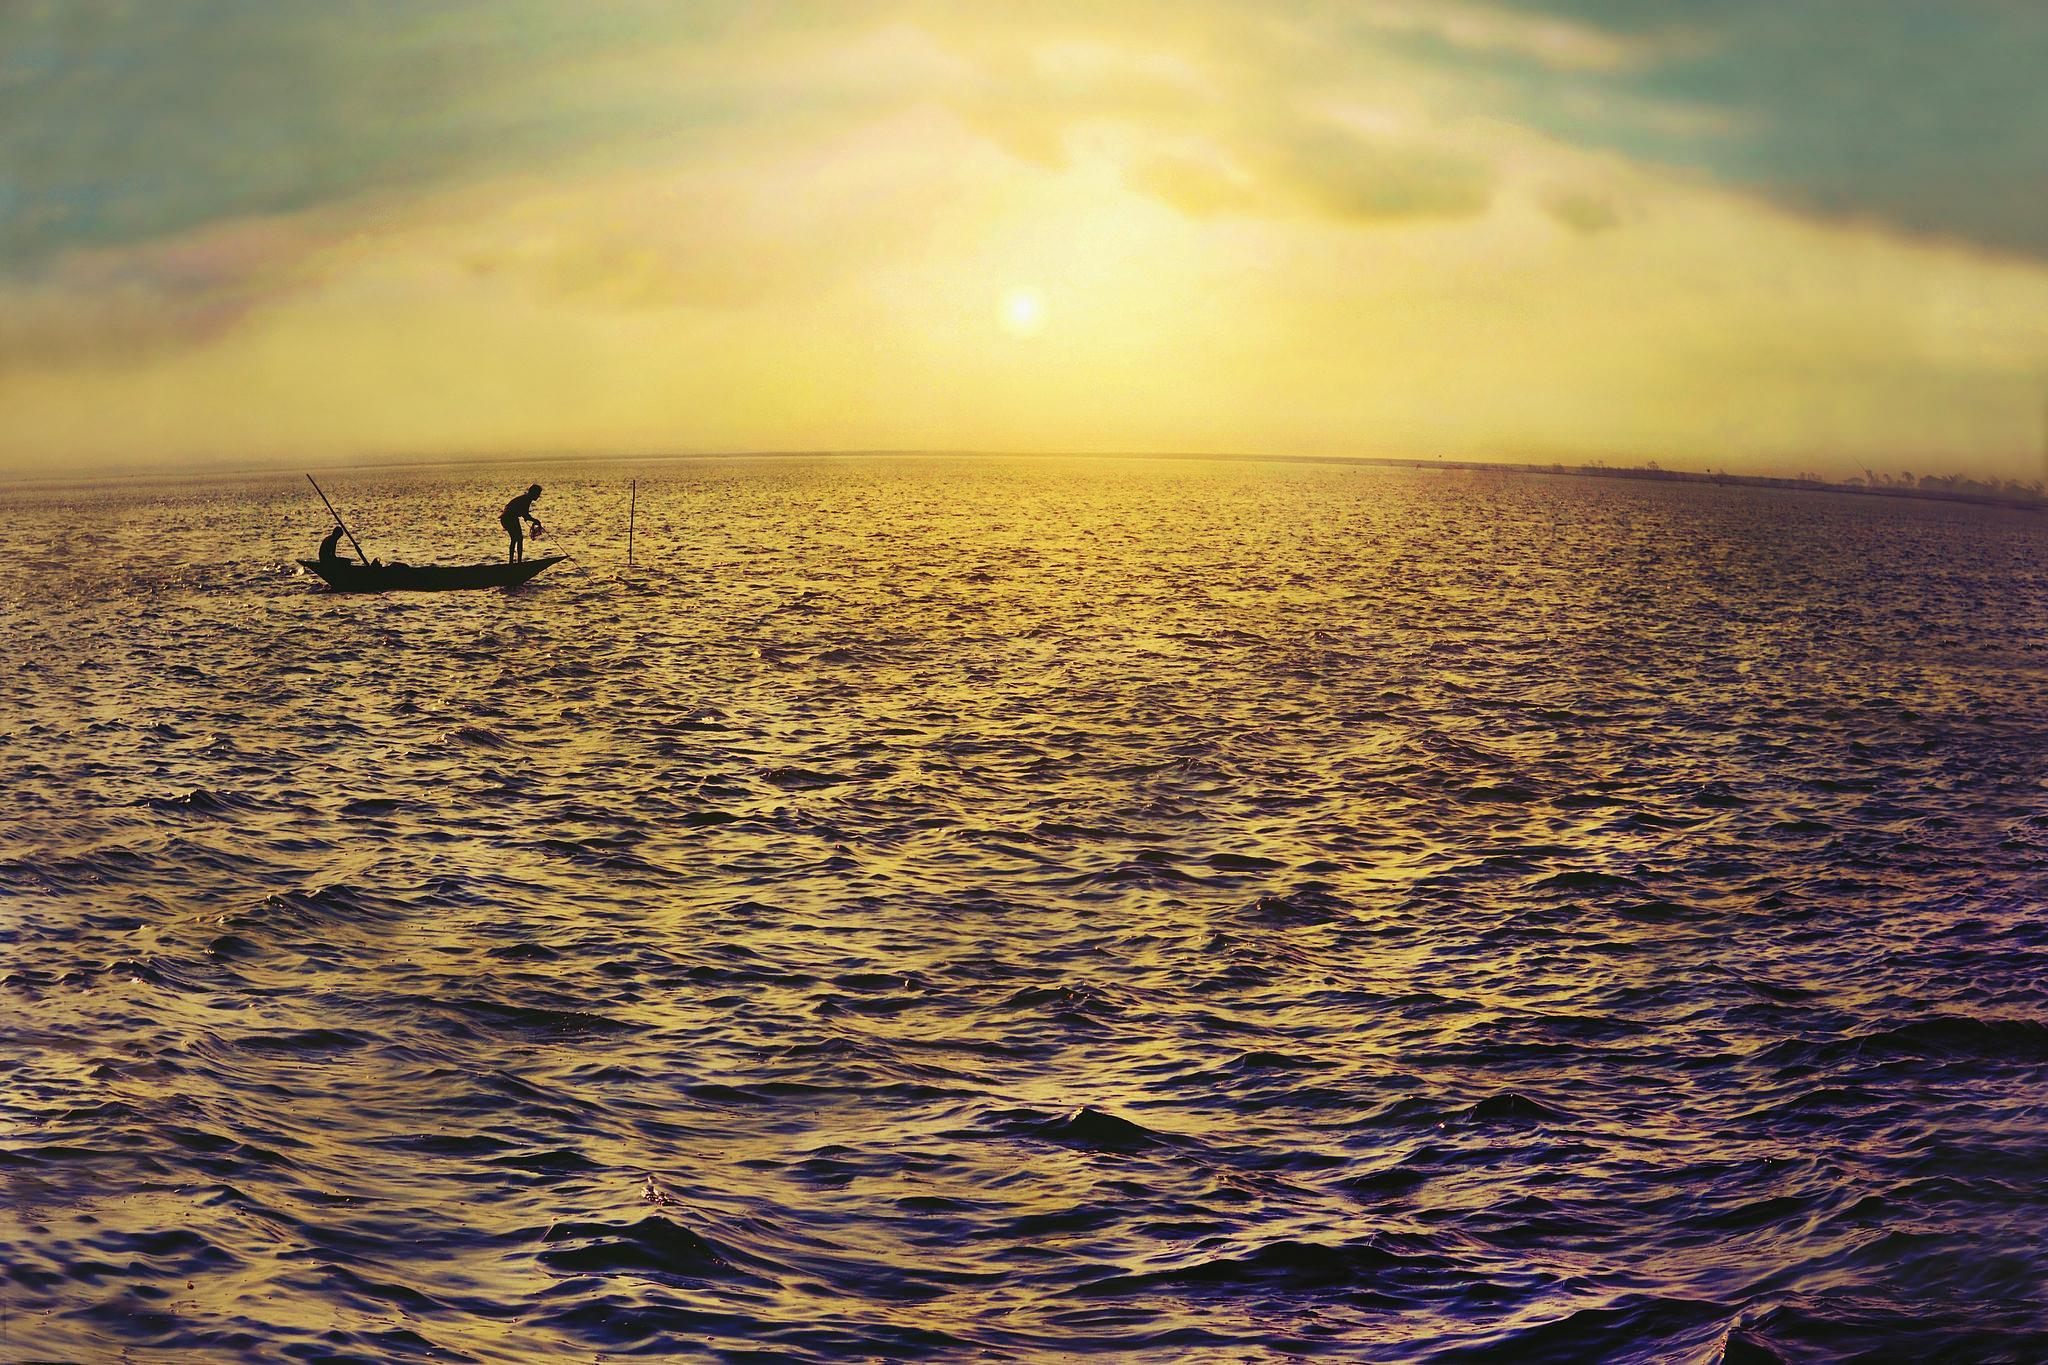 Fishing at golden hour  by oliurpritom